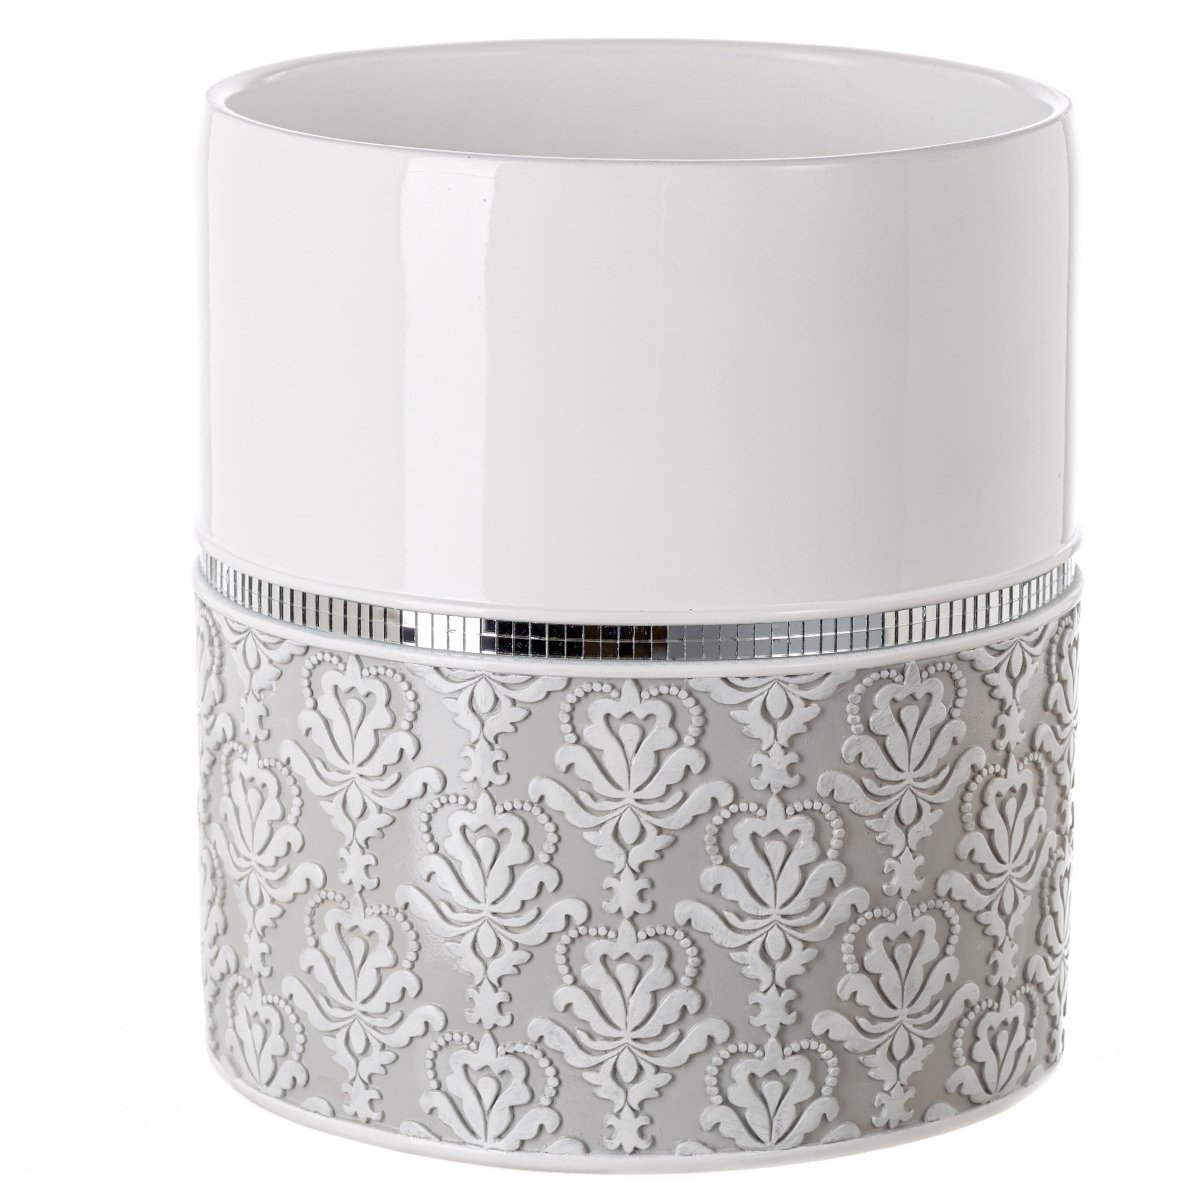 Creative Scents Mirror Damask Bathroom Trash Can, Decorative Wastebasket, Design- Space Friendly Bath Rubbish Dust Bin (Grey & White)